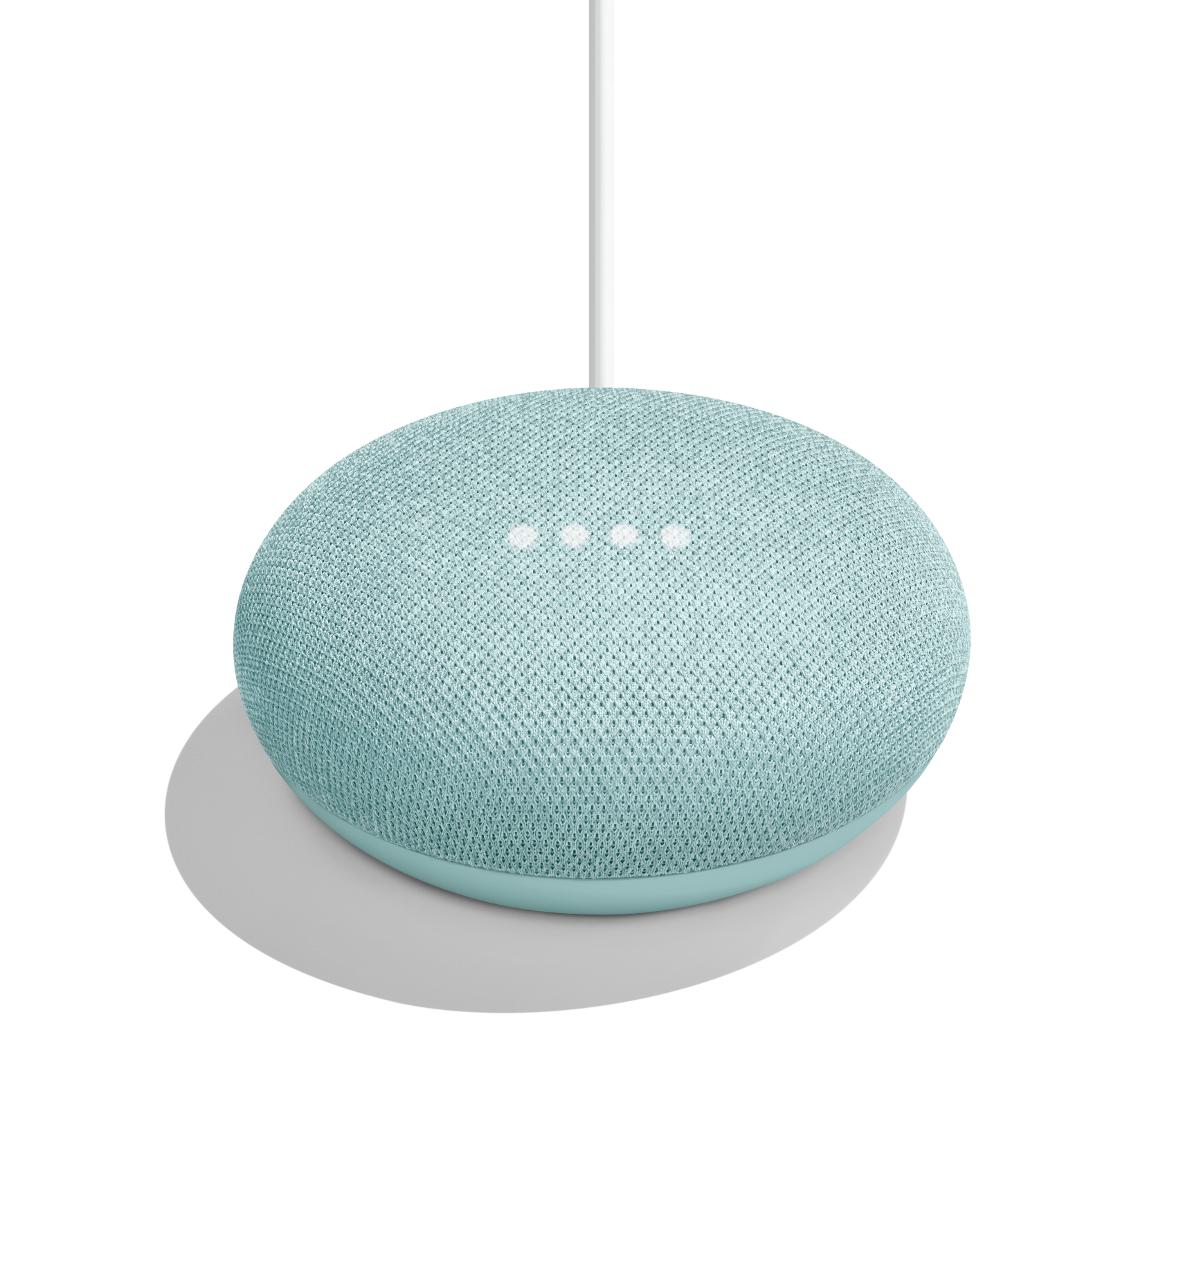 Google Home Mini Now Available in Aqua